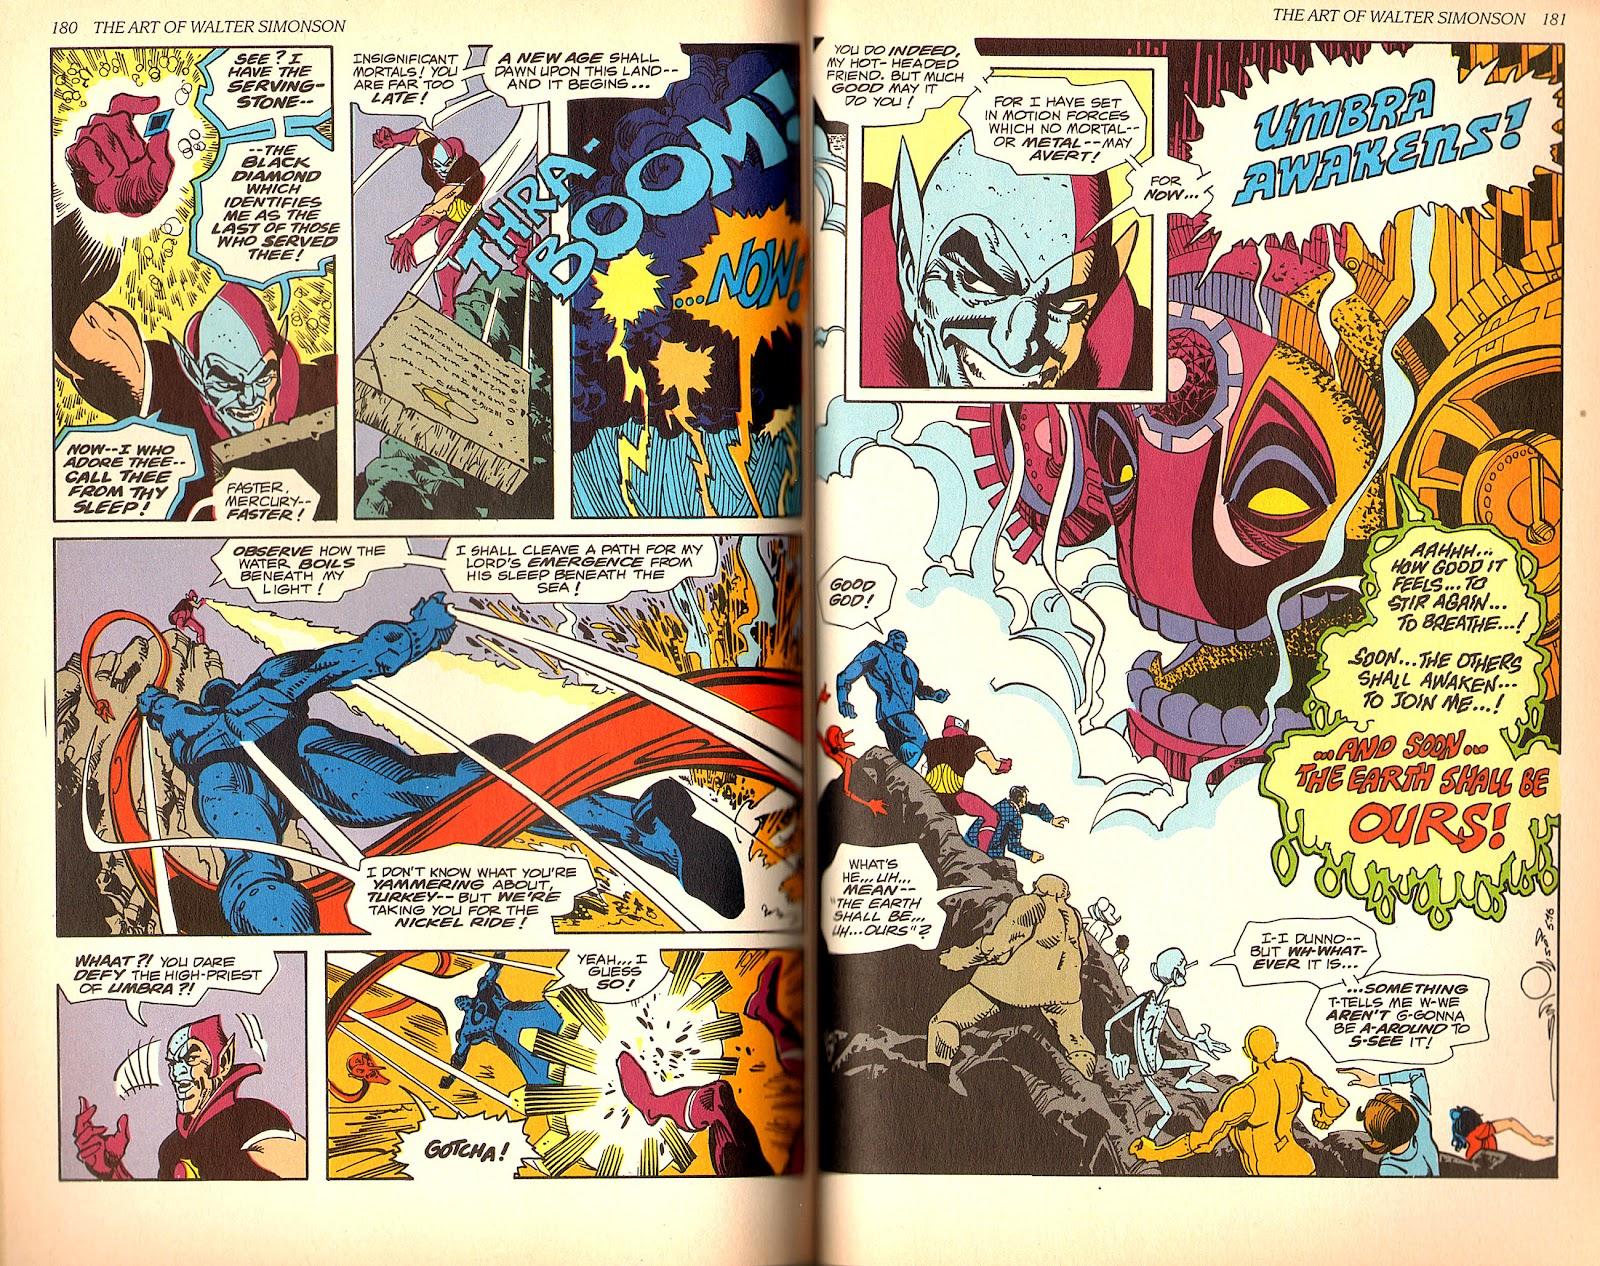 Read online The Art of Walter Simonson comic -  Issue # TPB - 92